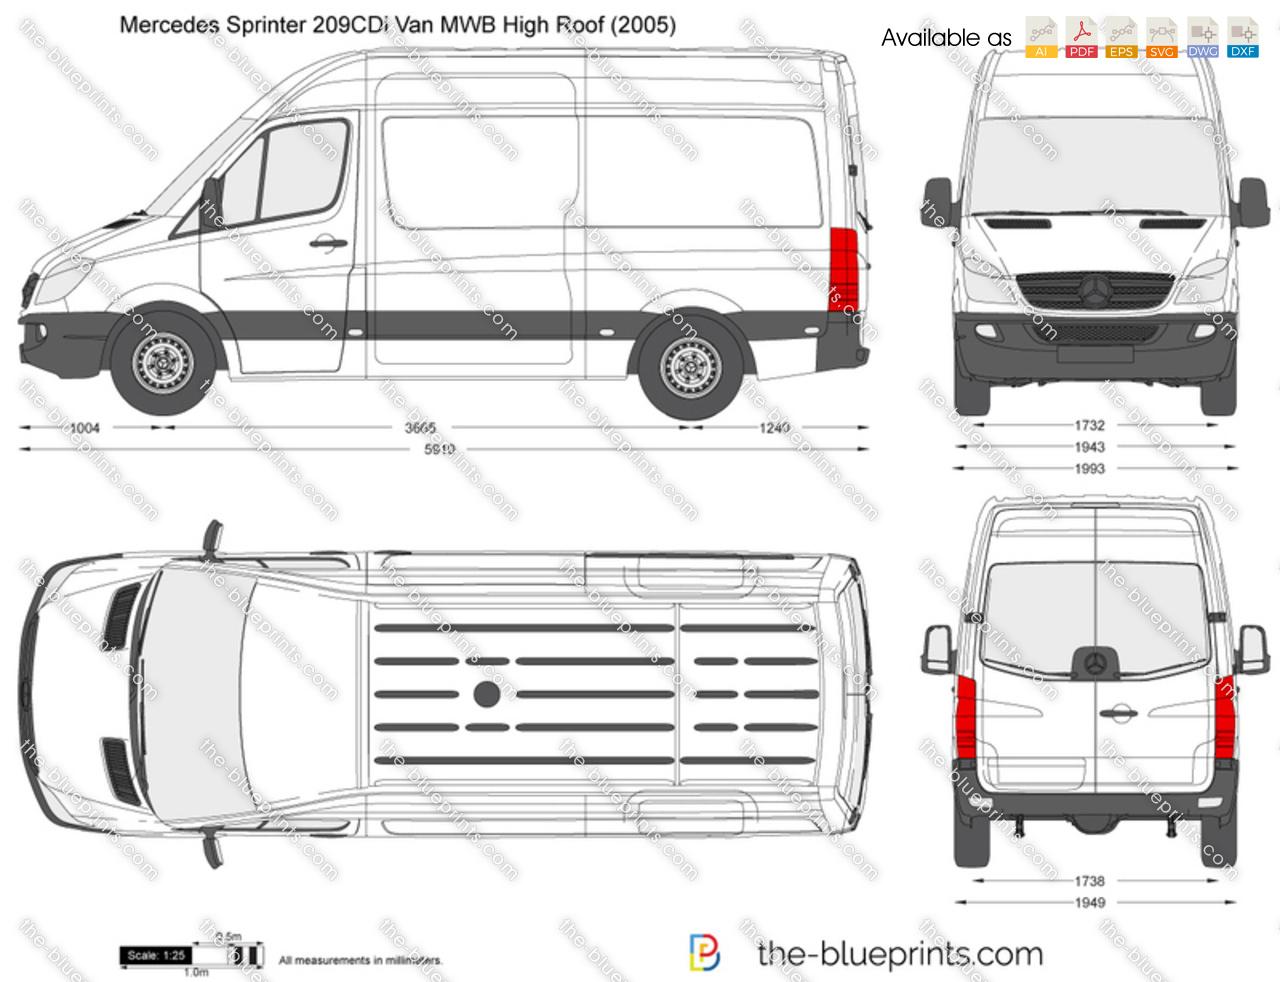 Mercedes Benz Sprinter 209cdi Van Mwb High Roof Vector Drawing